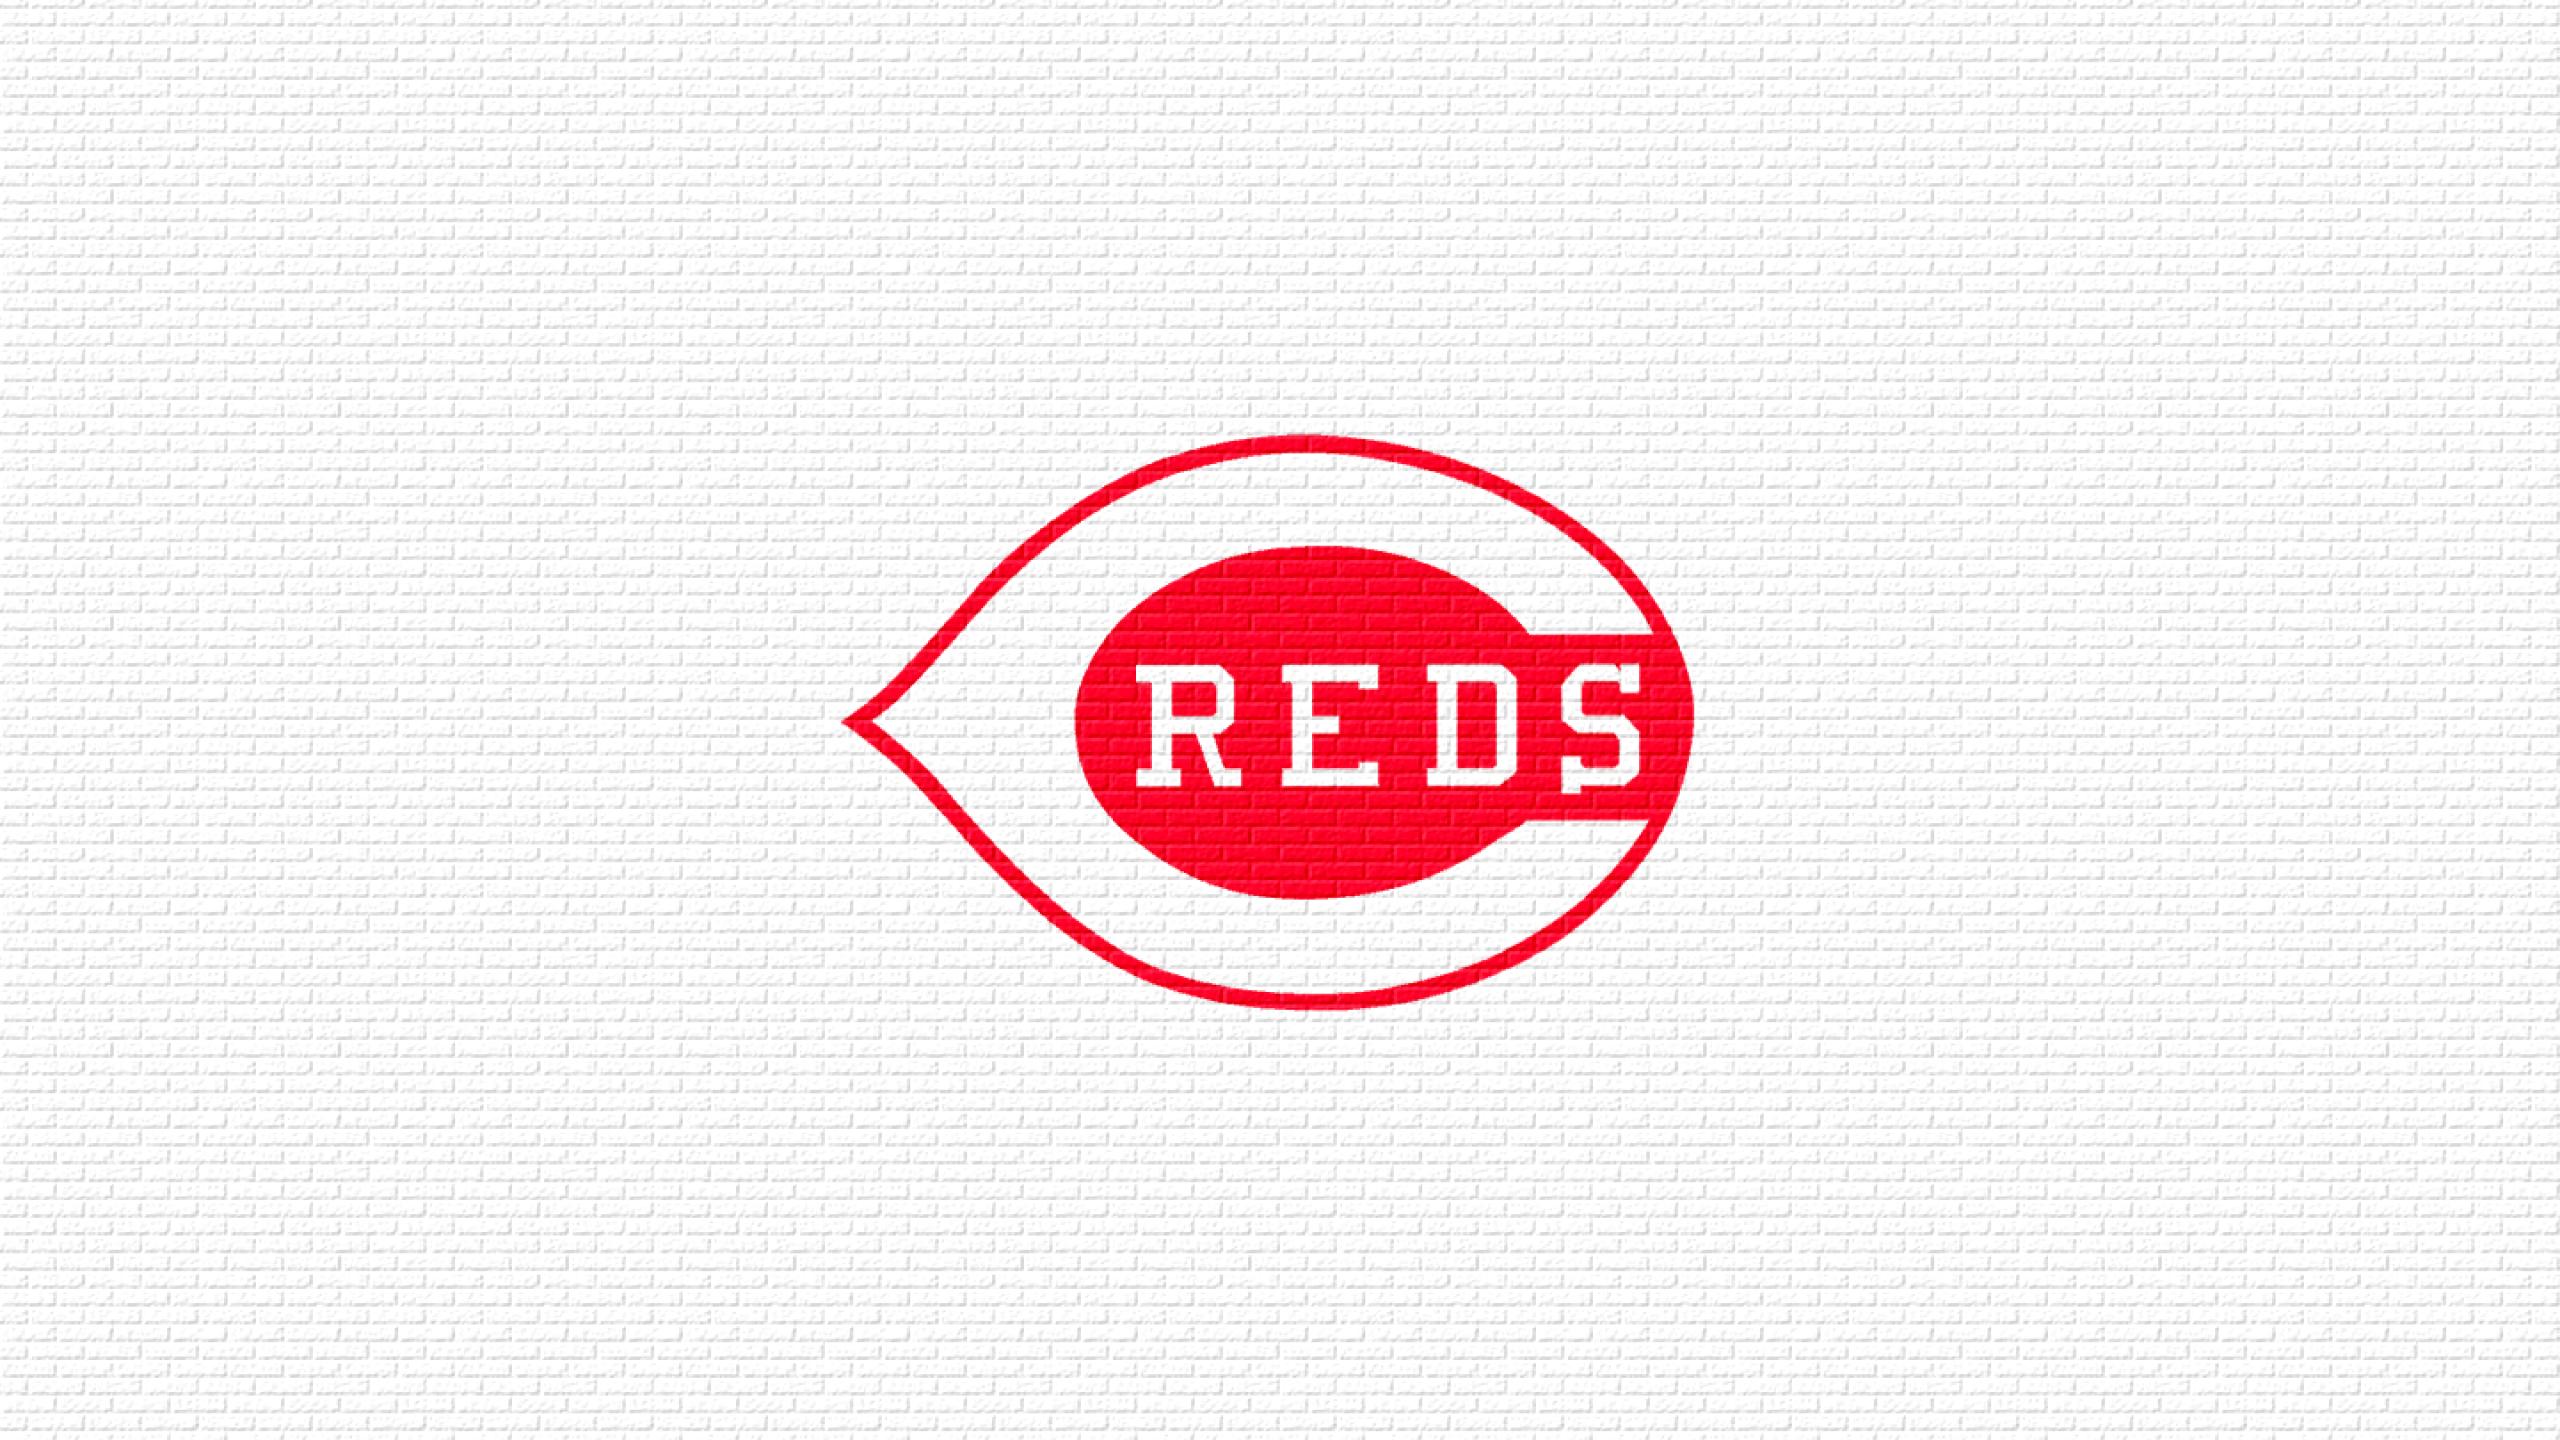 Cincinnati Reds Logo Clip Art wallpaper   1060840 2560x1440